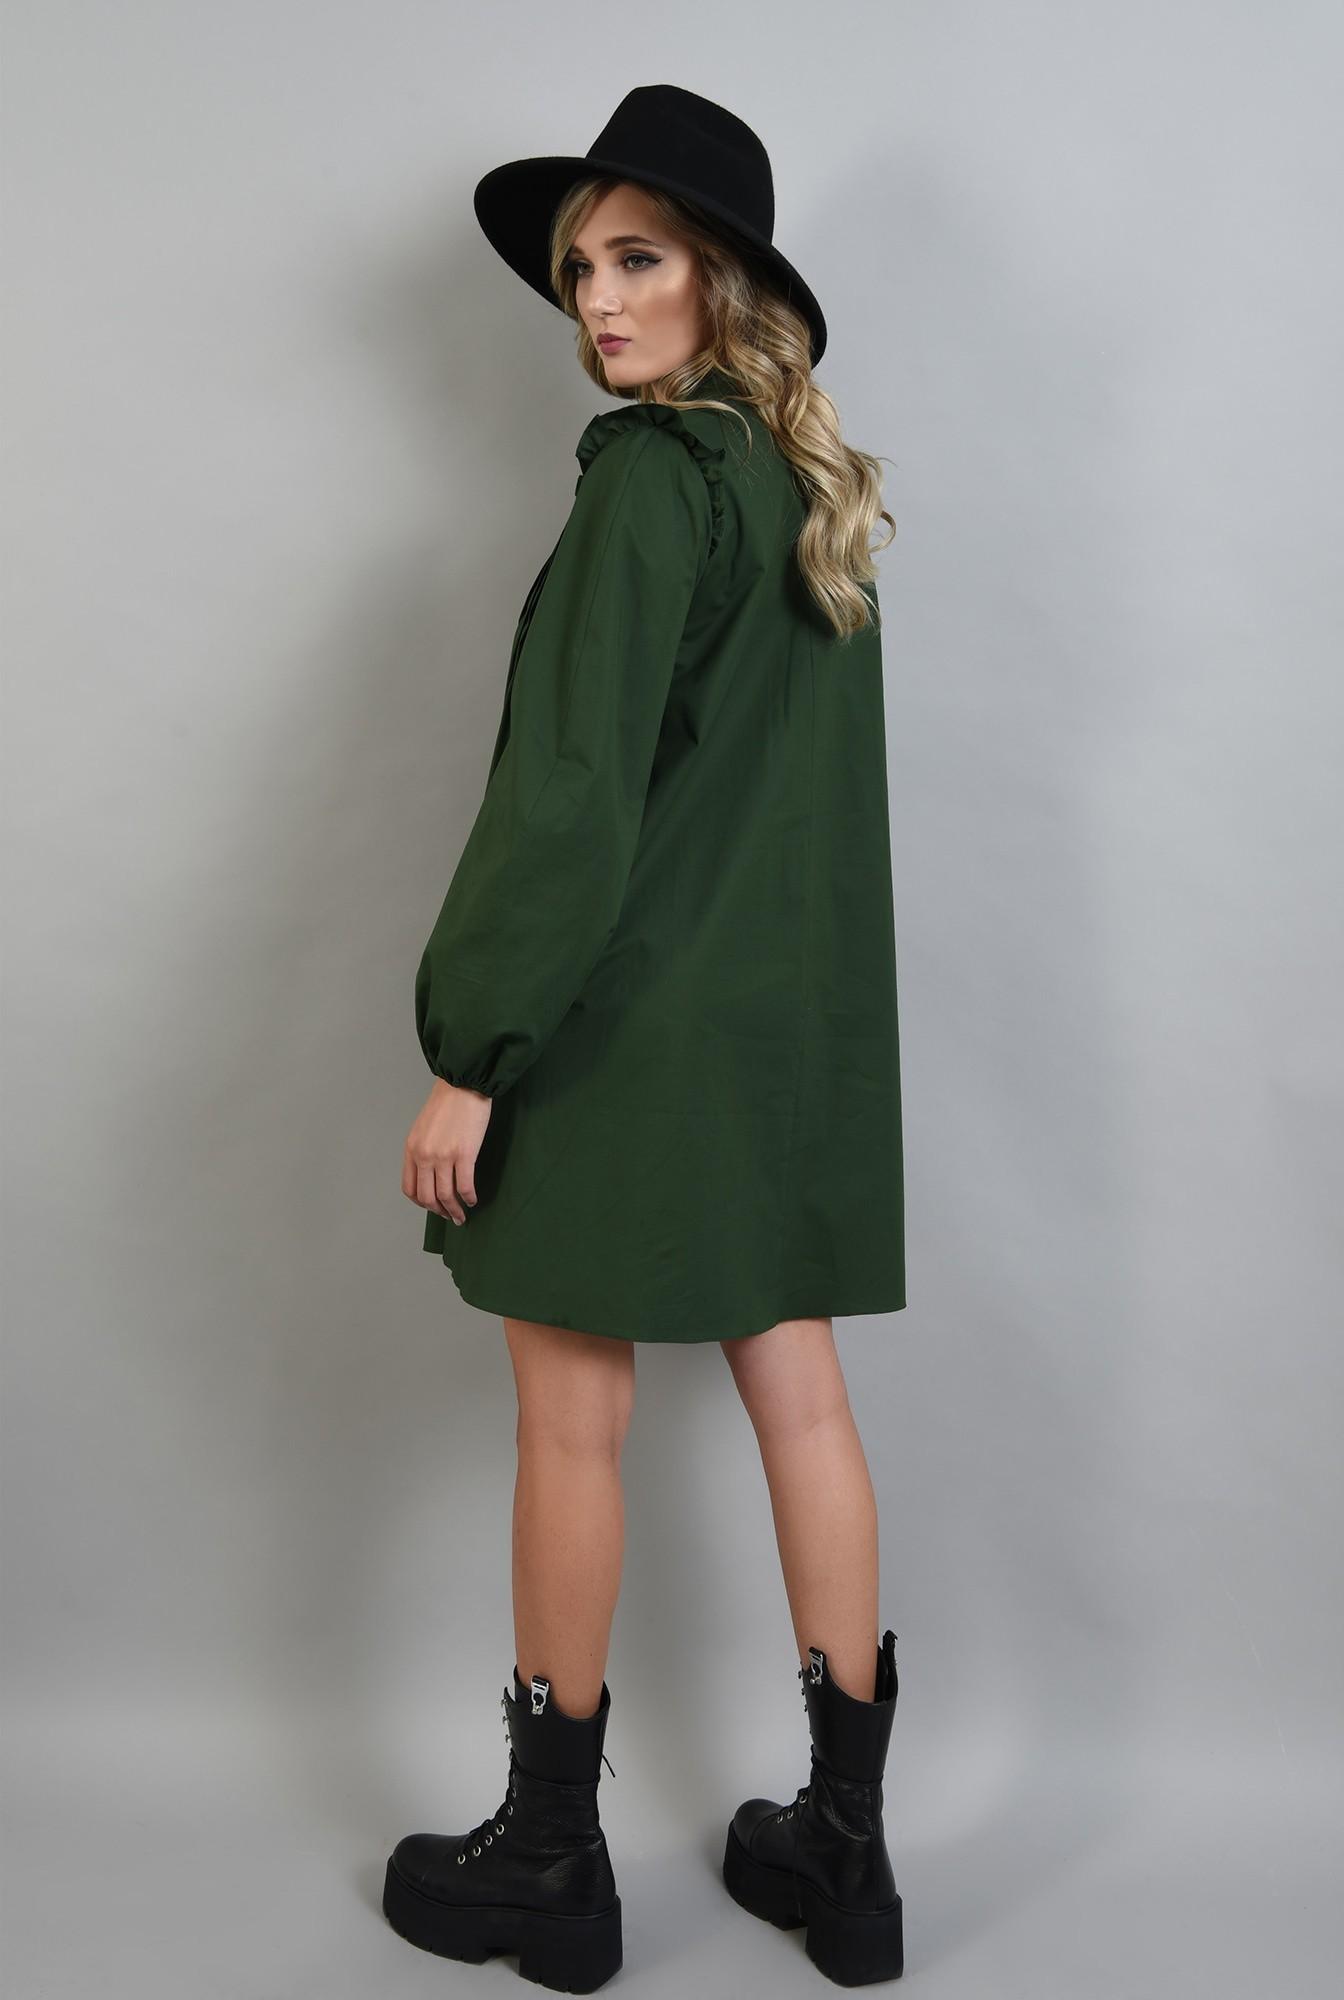 1 - 360 - rochie verde, din bumbac, cu pliuri decorative, maneci bufante